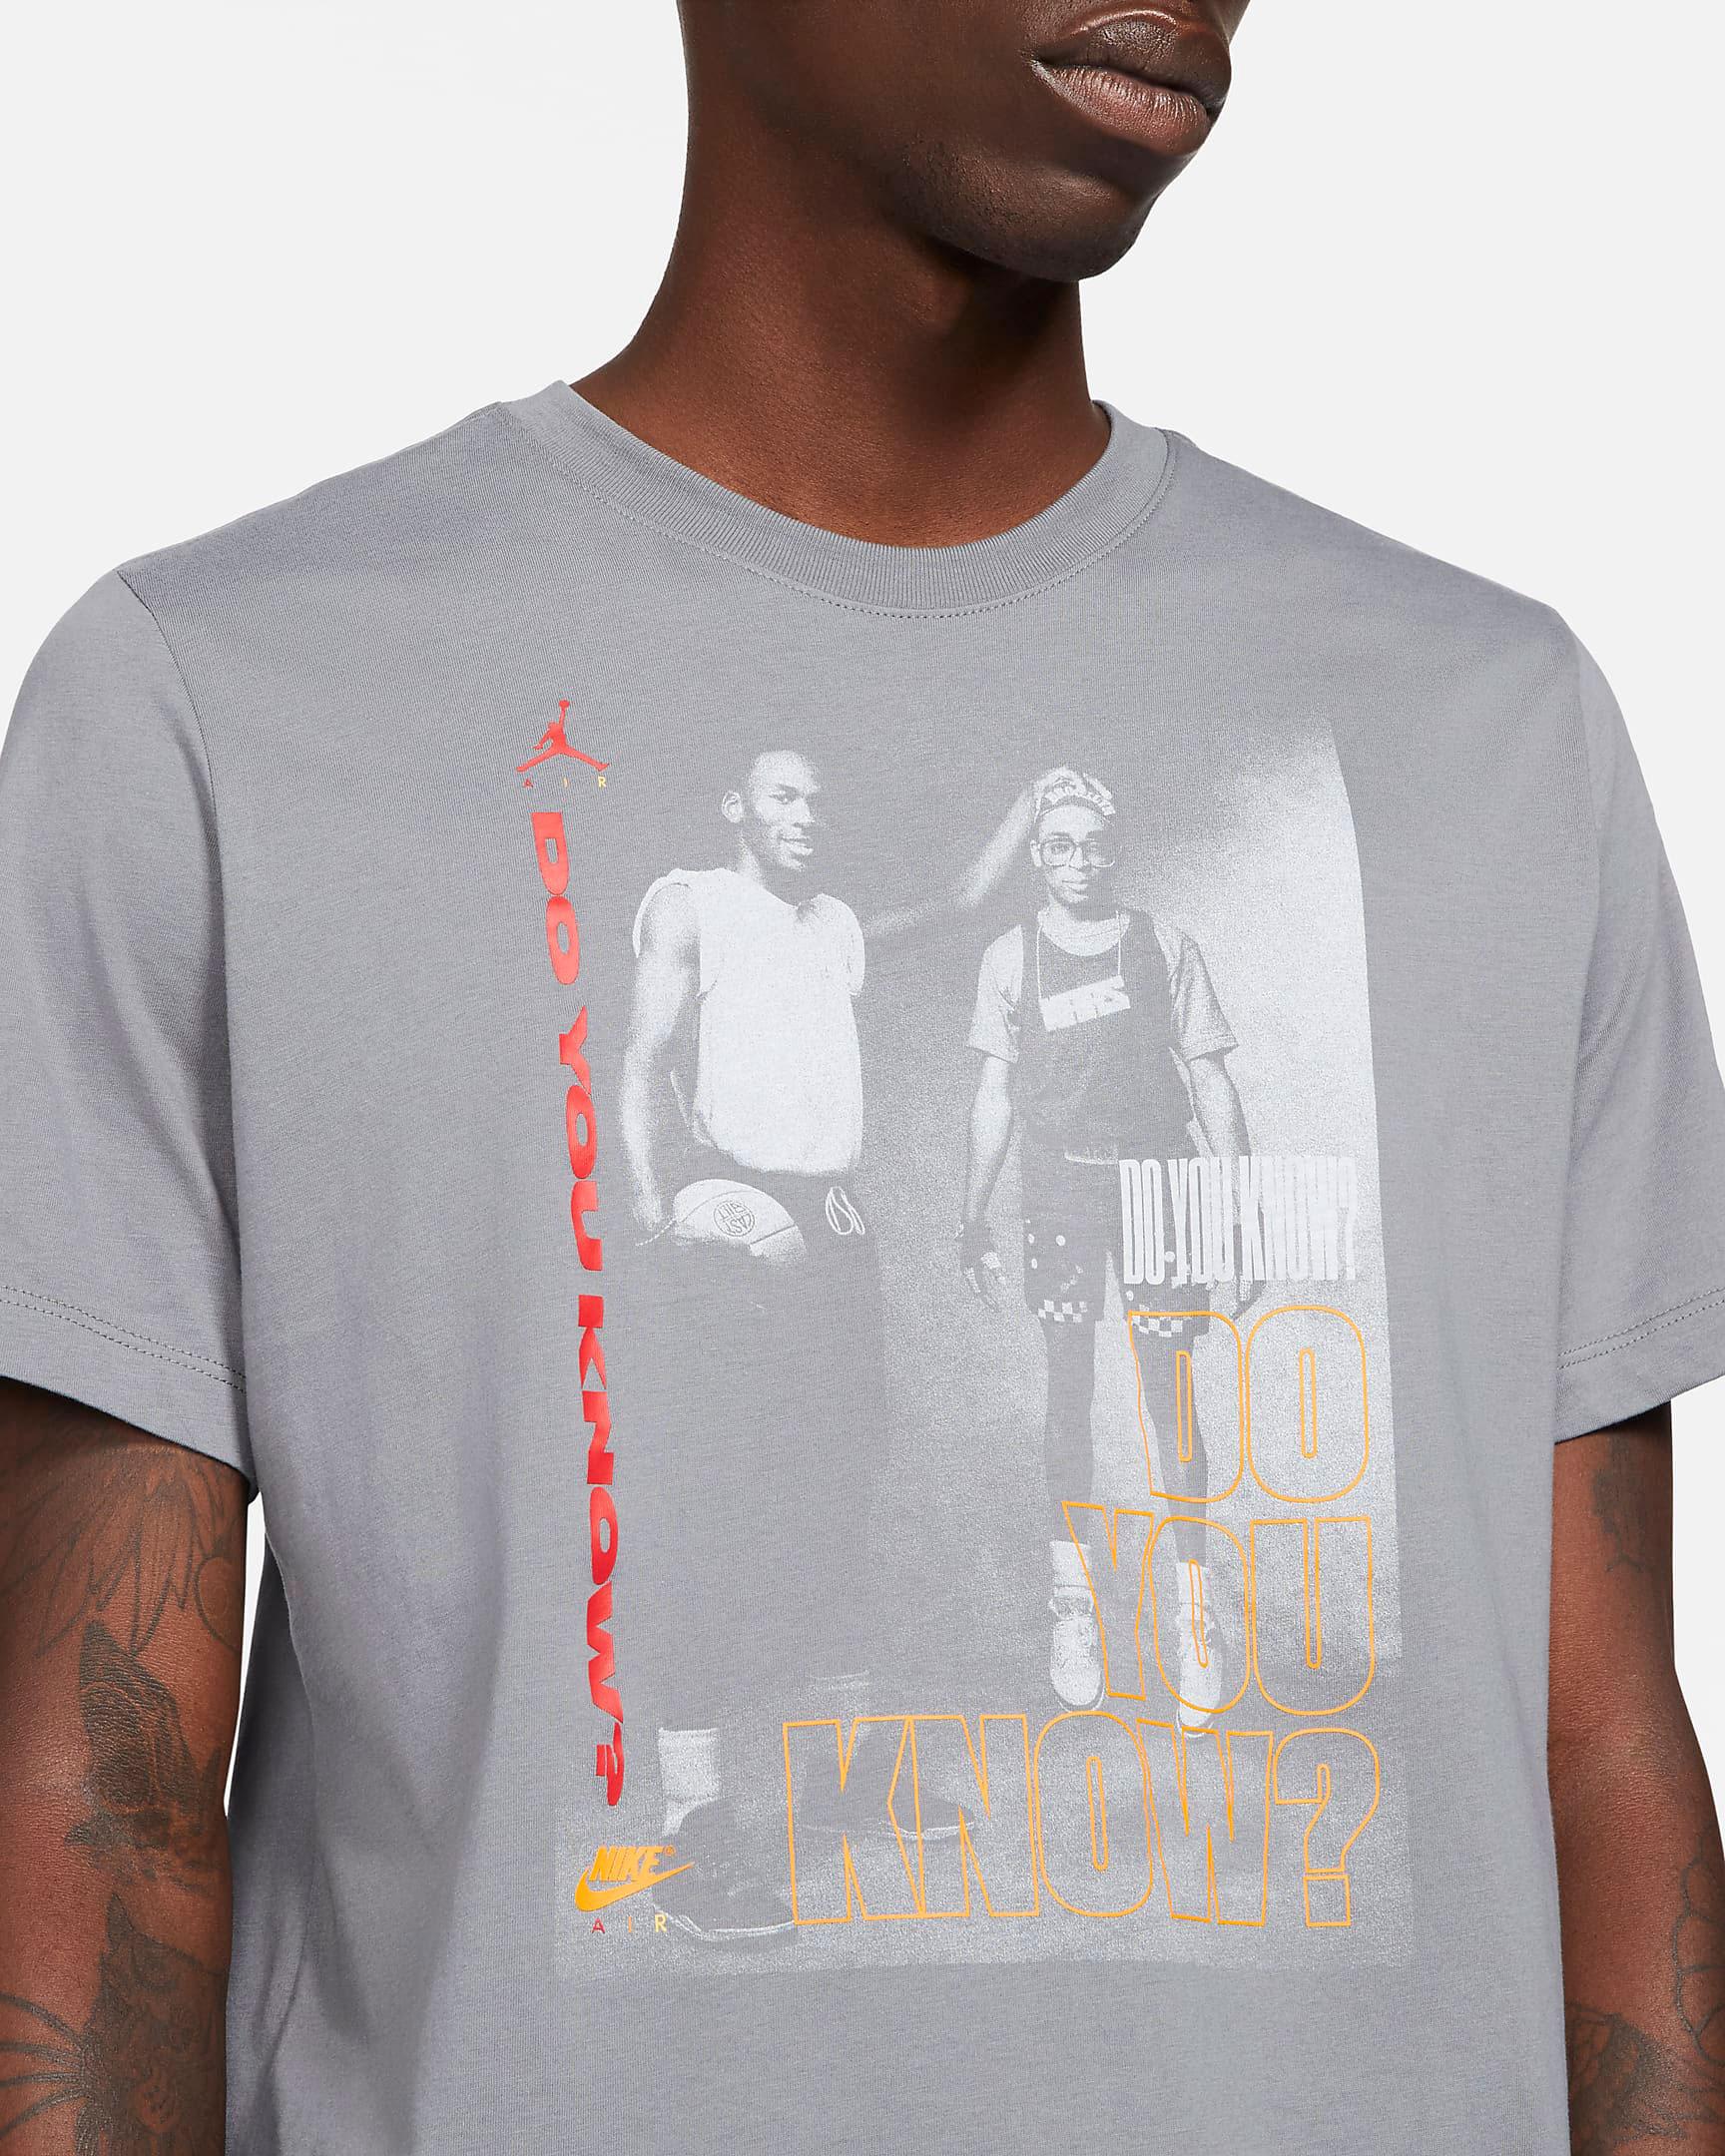 where-to-buy-air-jordan-3-cool-grey-2021-shirt-2